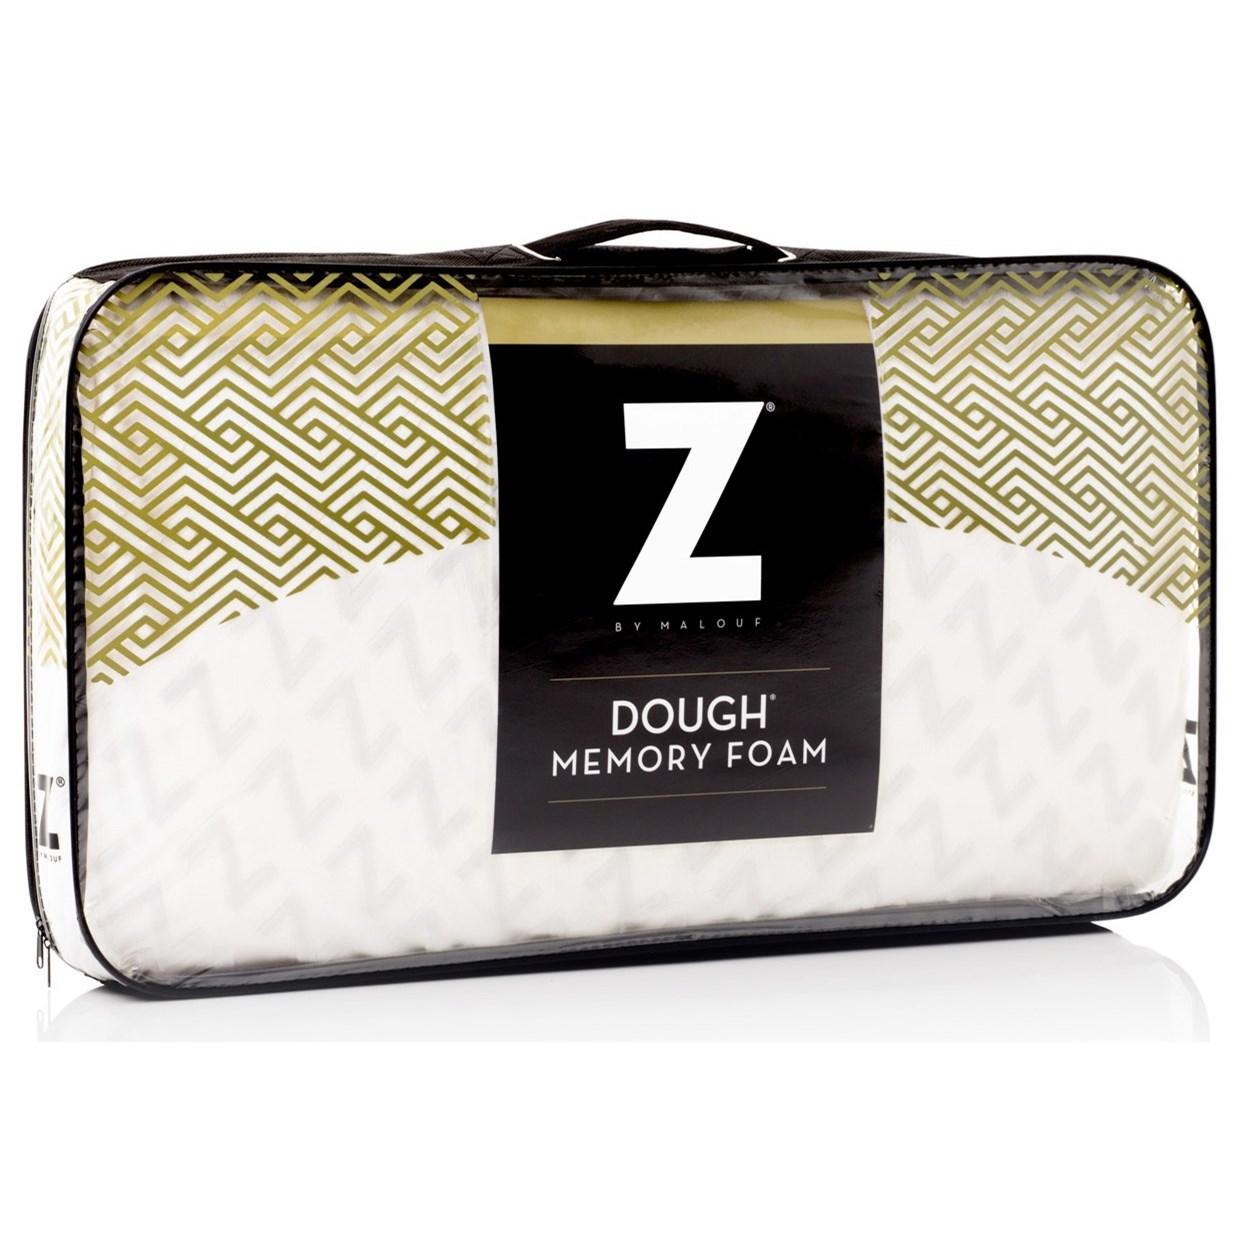 Malouf Dough King Dough High Loft Firm Pillow - Item Number: ZZKKHFDF